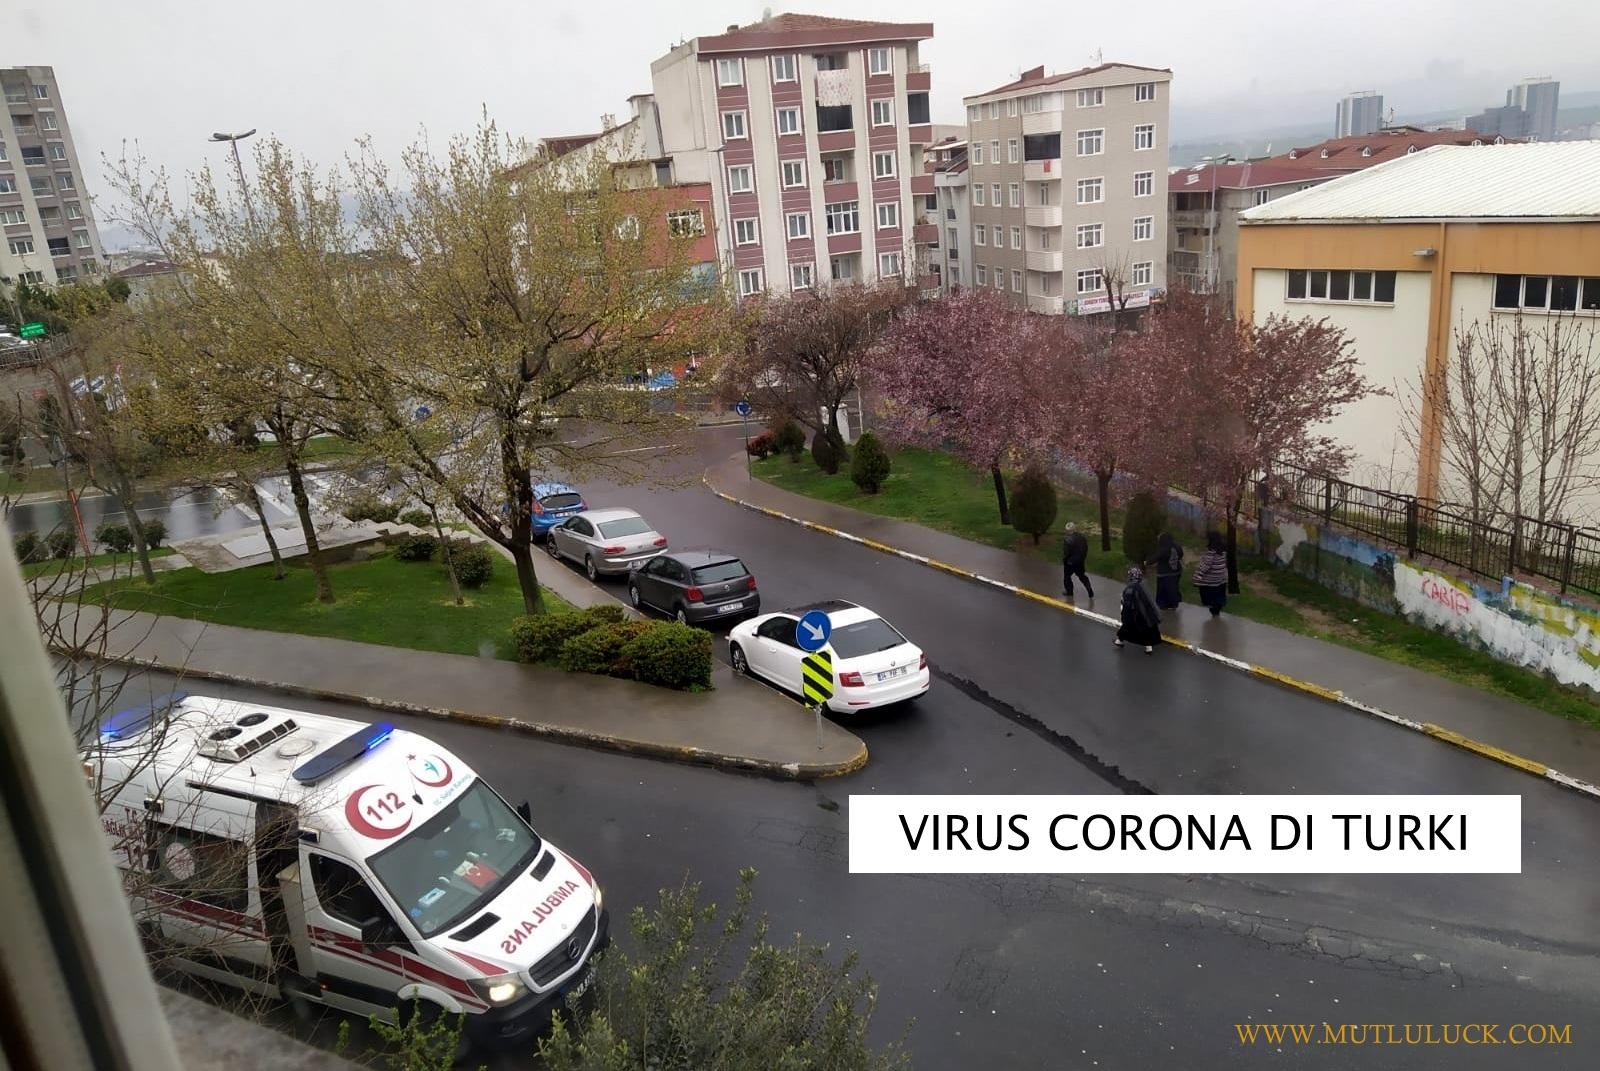 VIRUS CORONA DI TURKI, PENGGUNA TRANSPORTASI UMUM MENURUN